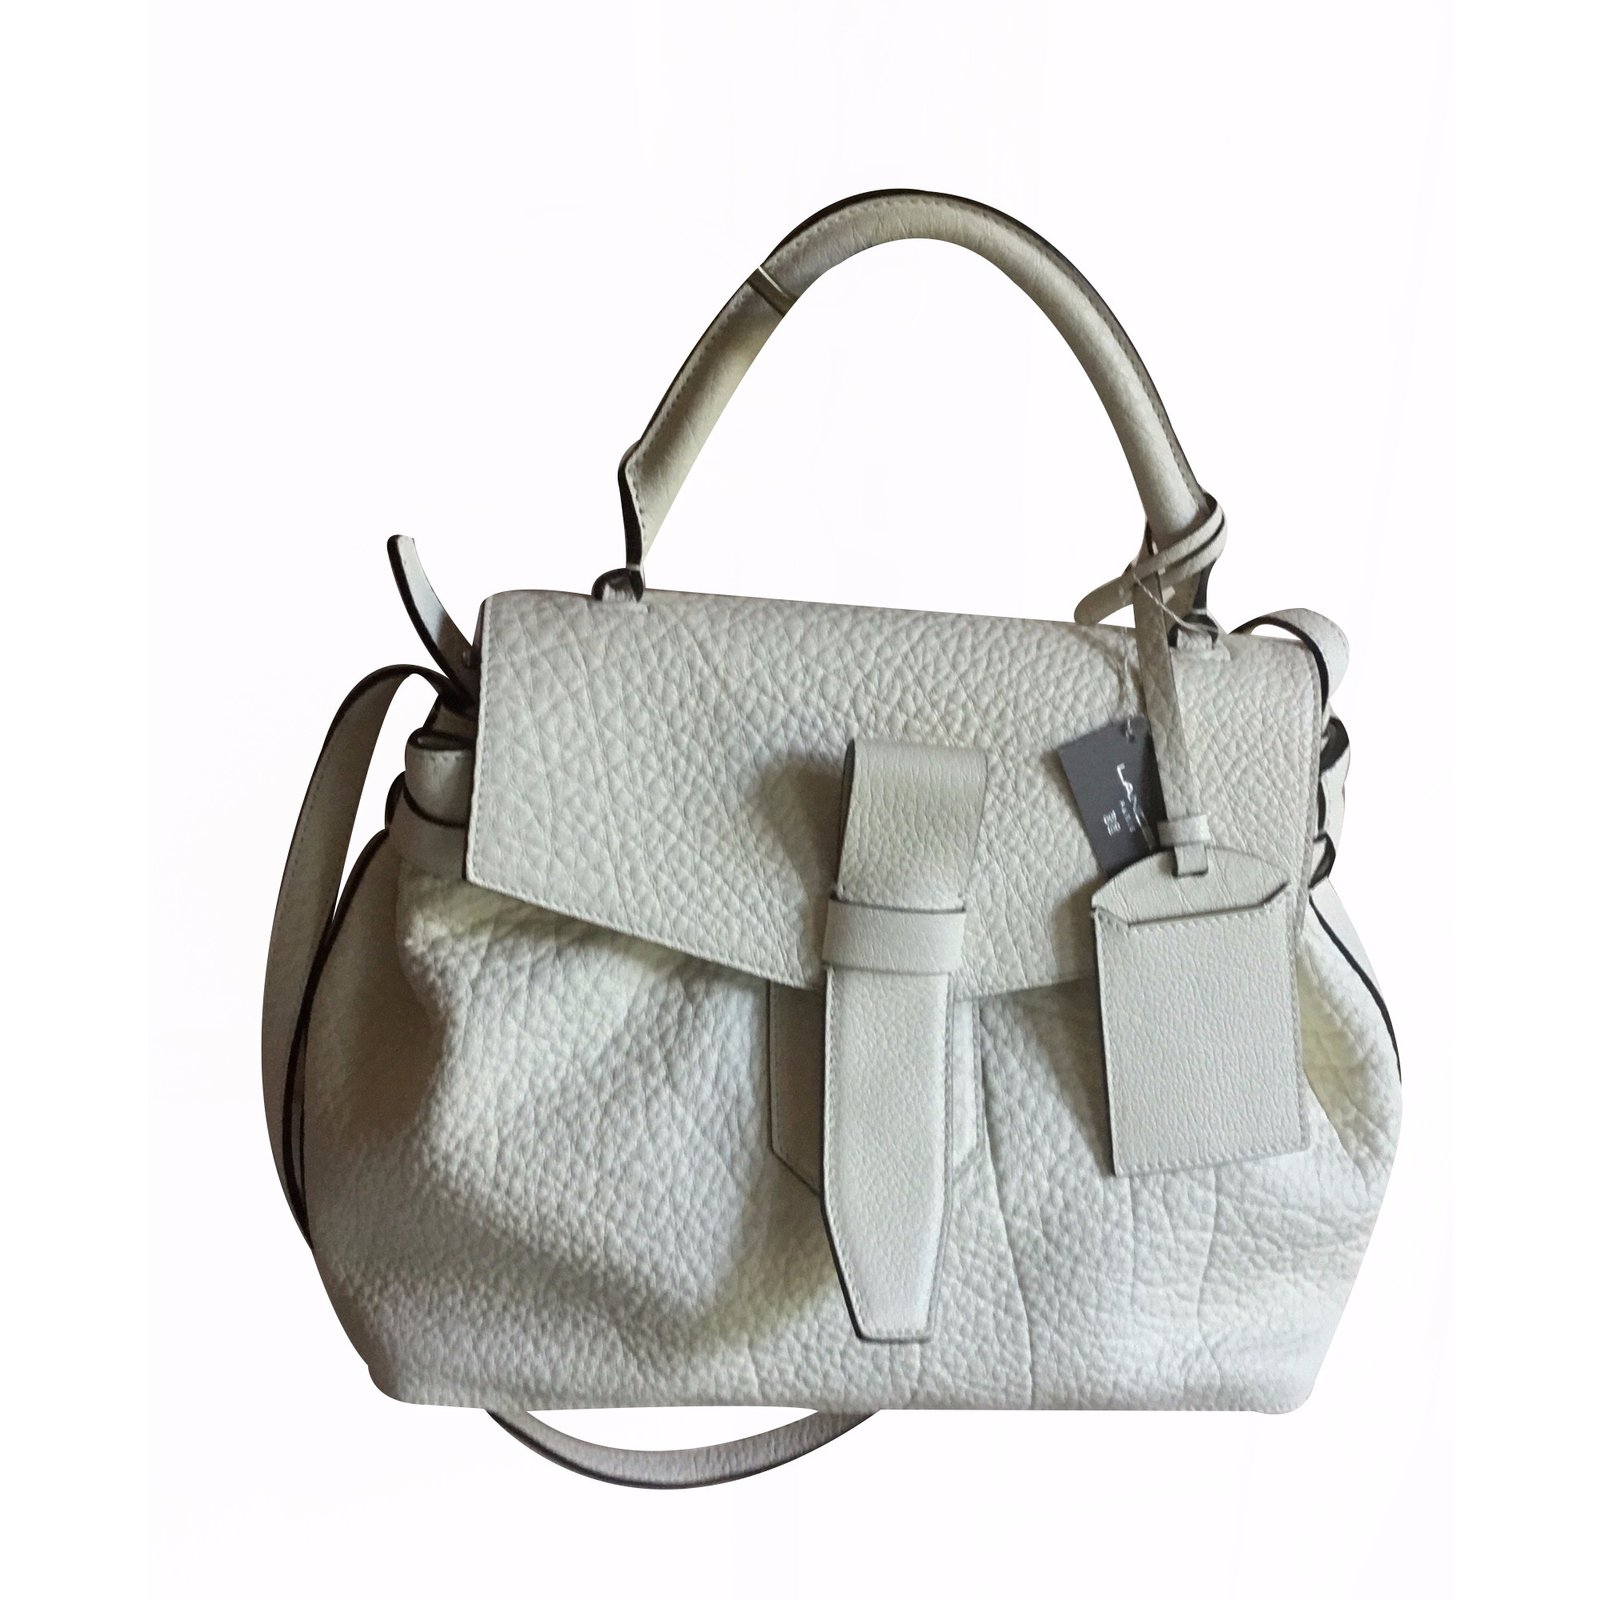 sacs main lancel sac lancel mod le charlie port main coloris alb tre cuir blanc cass ref. Black Bedroom Furniture Sets. Home Design Ideas